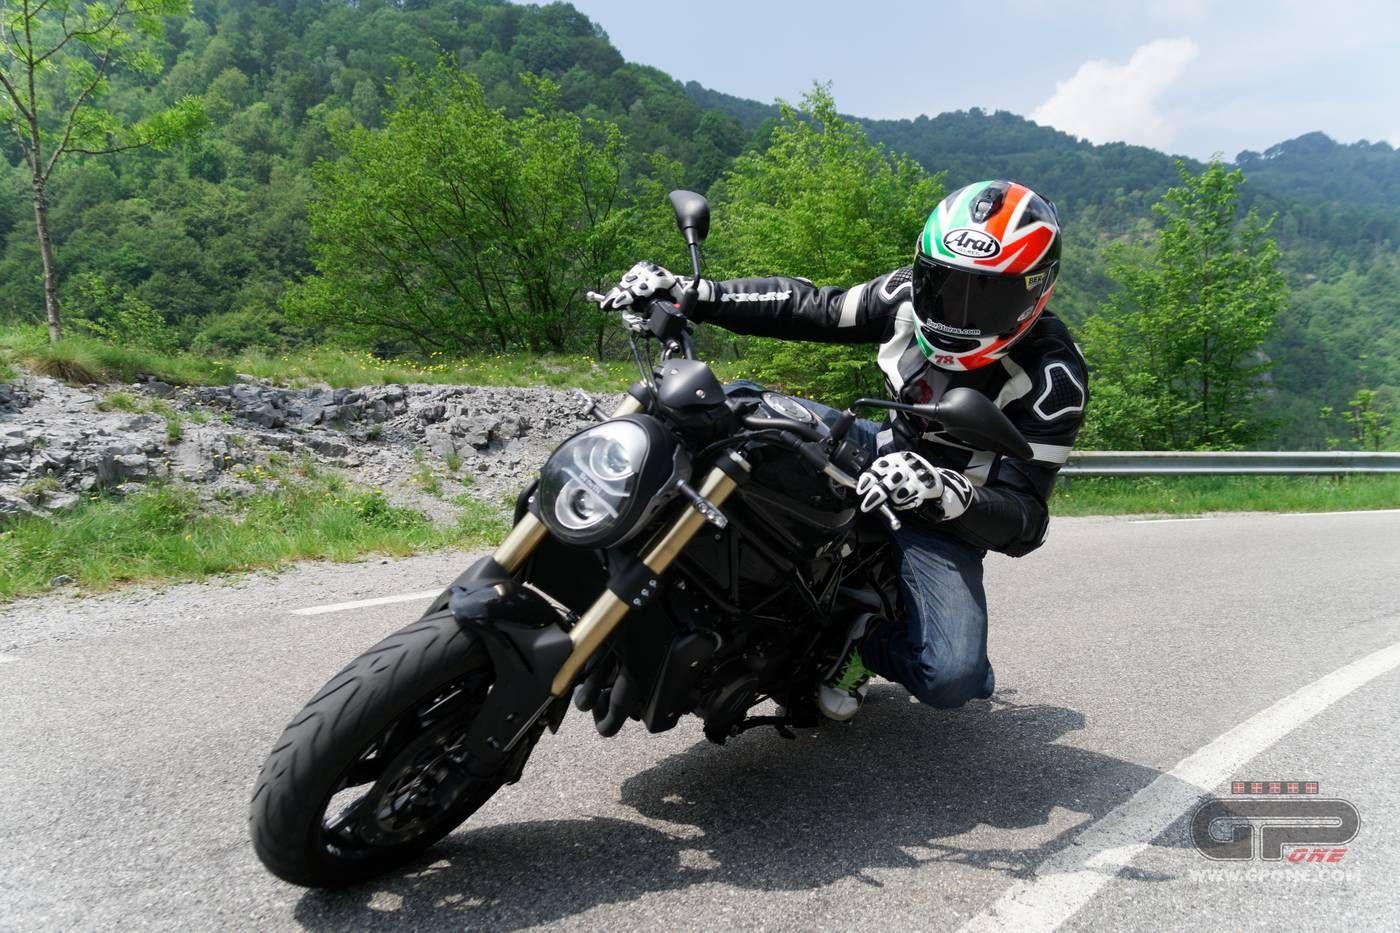 BMW: Prove Moto, prezzi e news | Pagina 7 - MotorBox